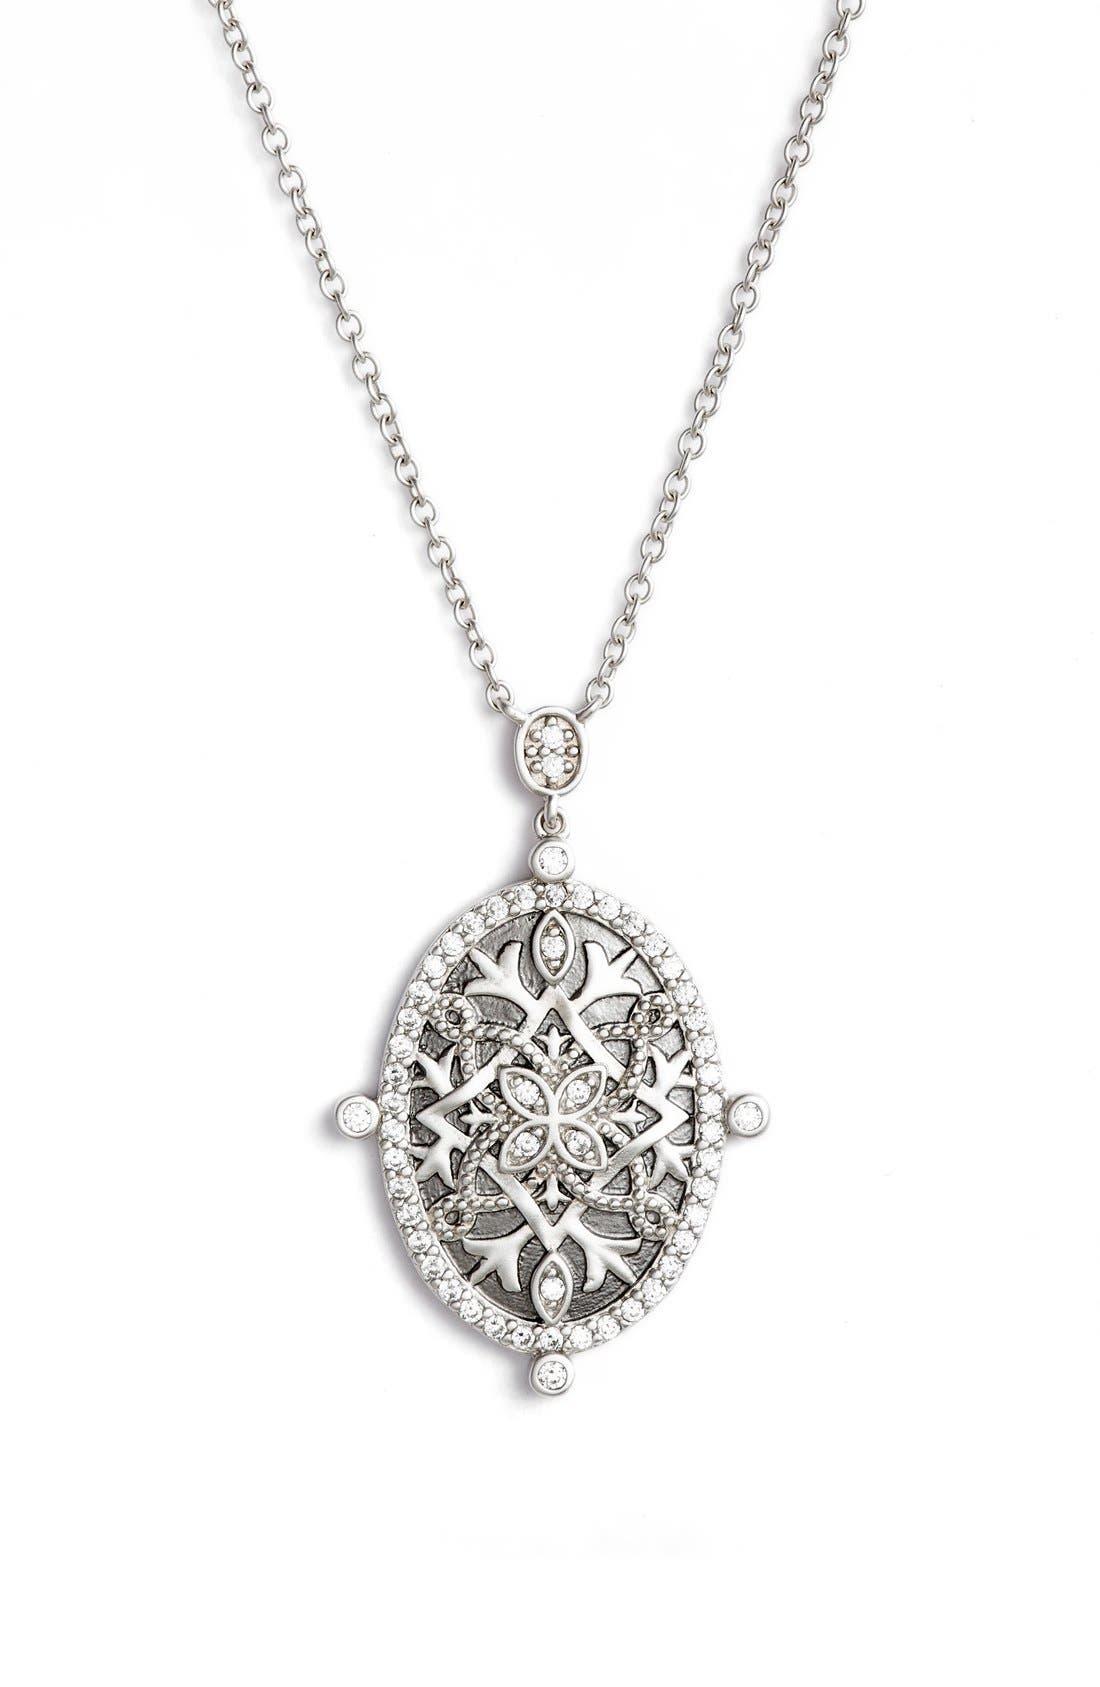 FREIDA ROTHMAN Contemporary Deco Celestial Pendant Necklace